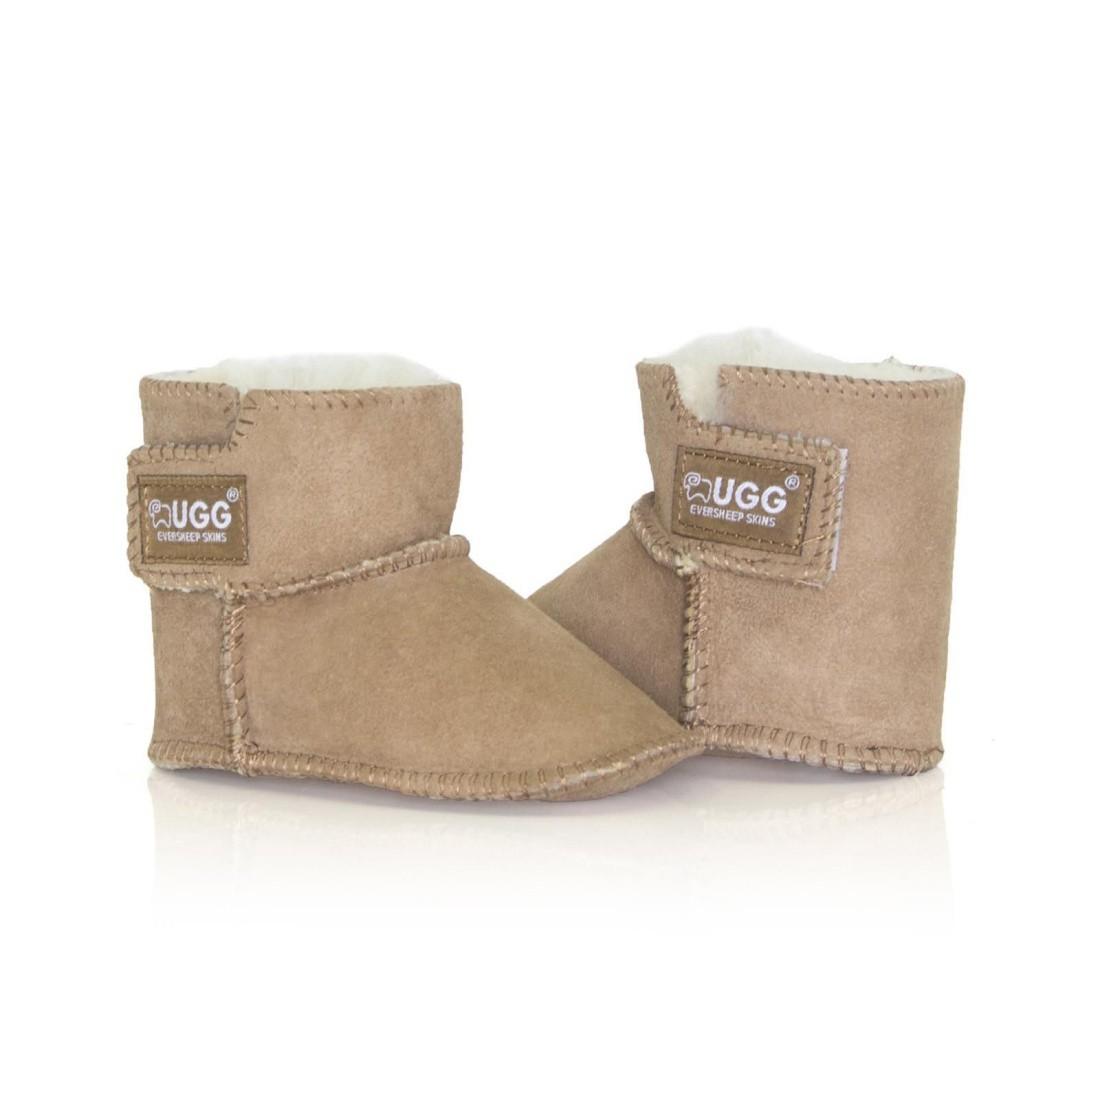 UGG Baby Erin Bootie Infant Boots - Chestnut - M